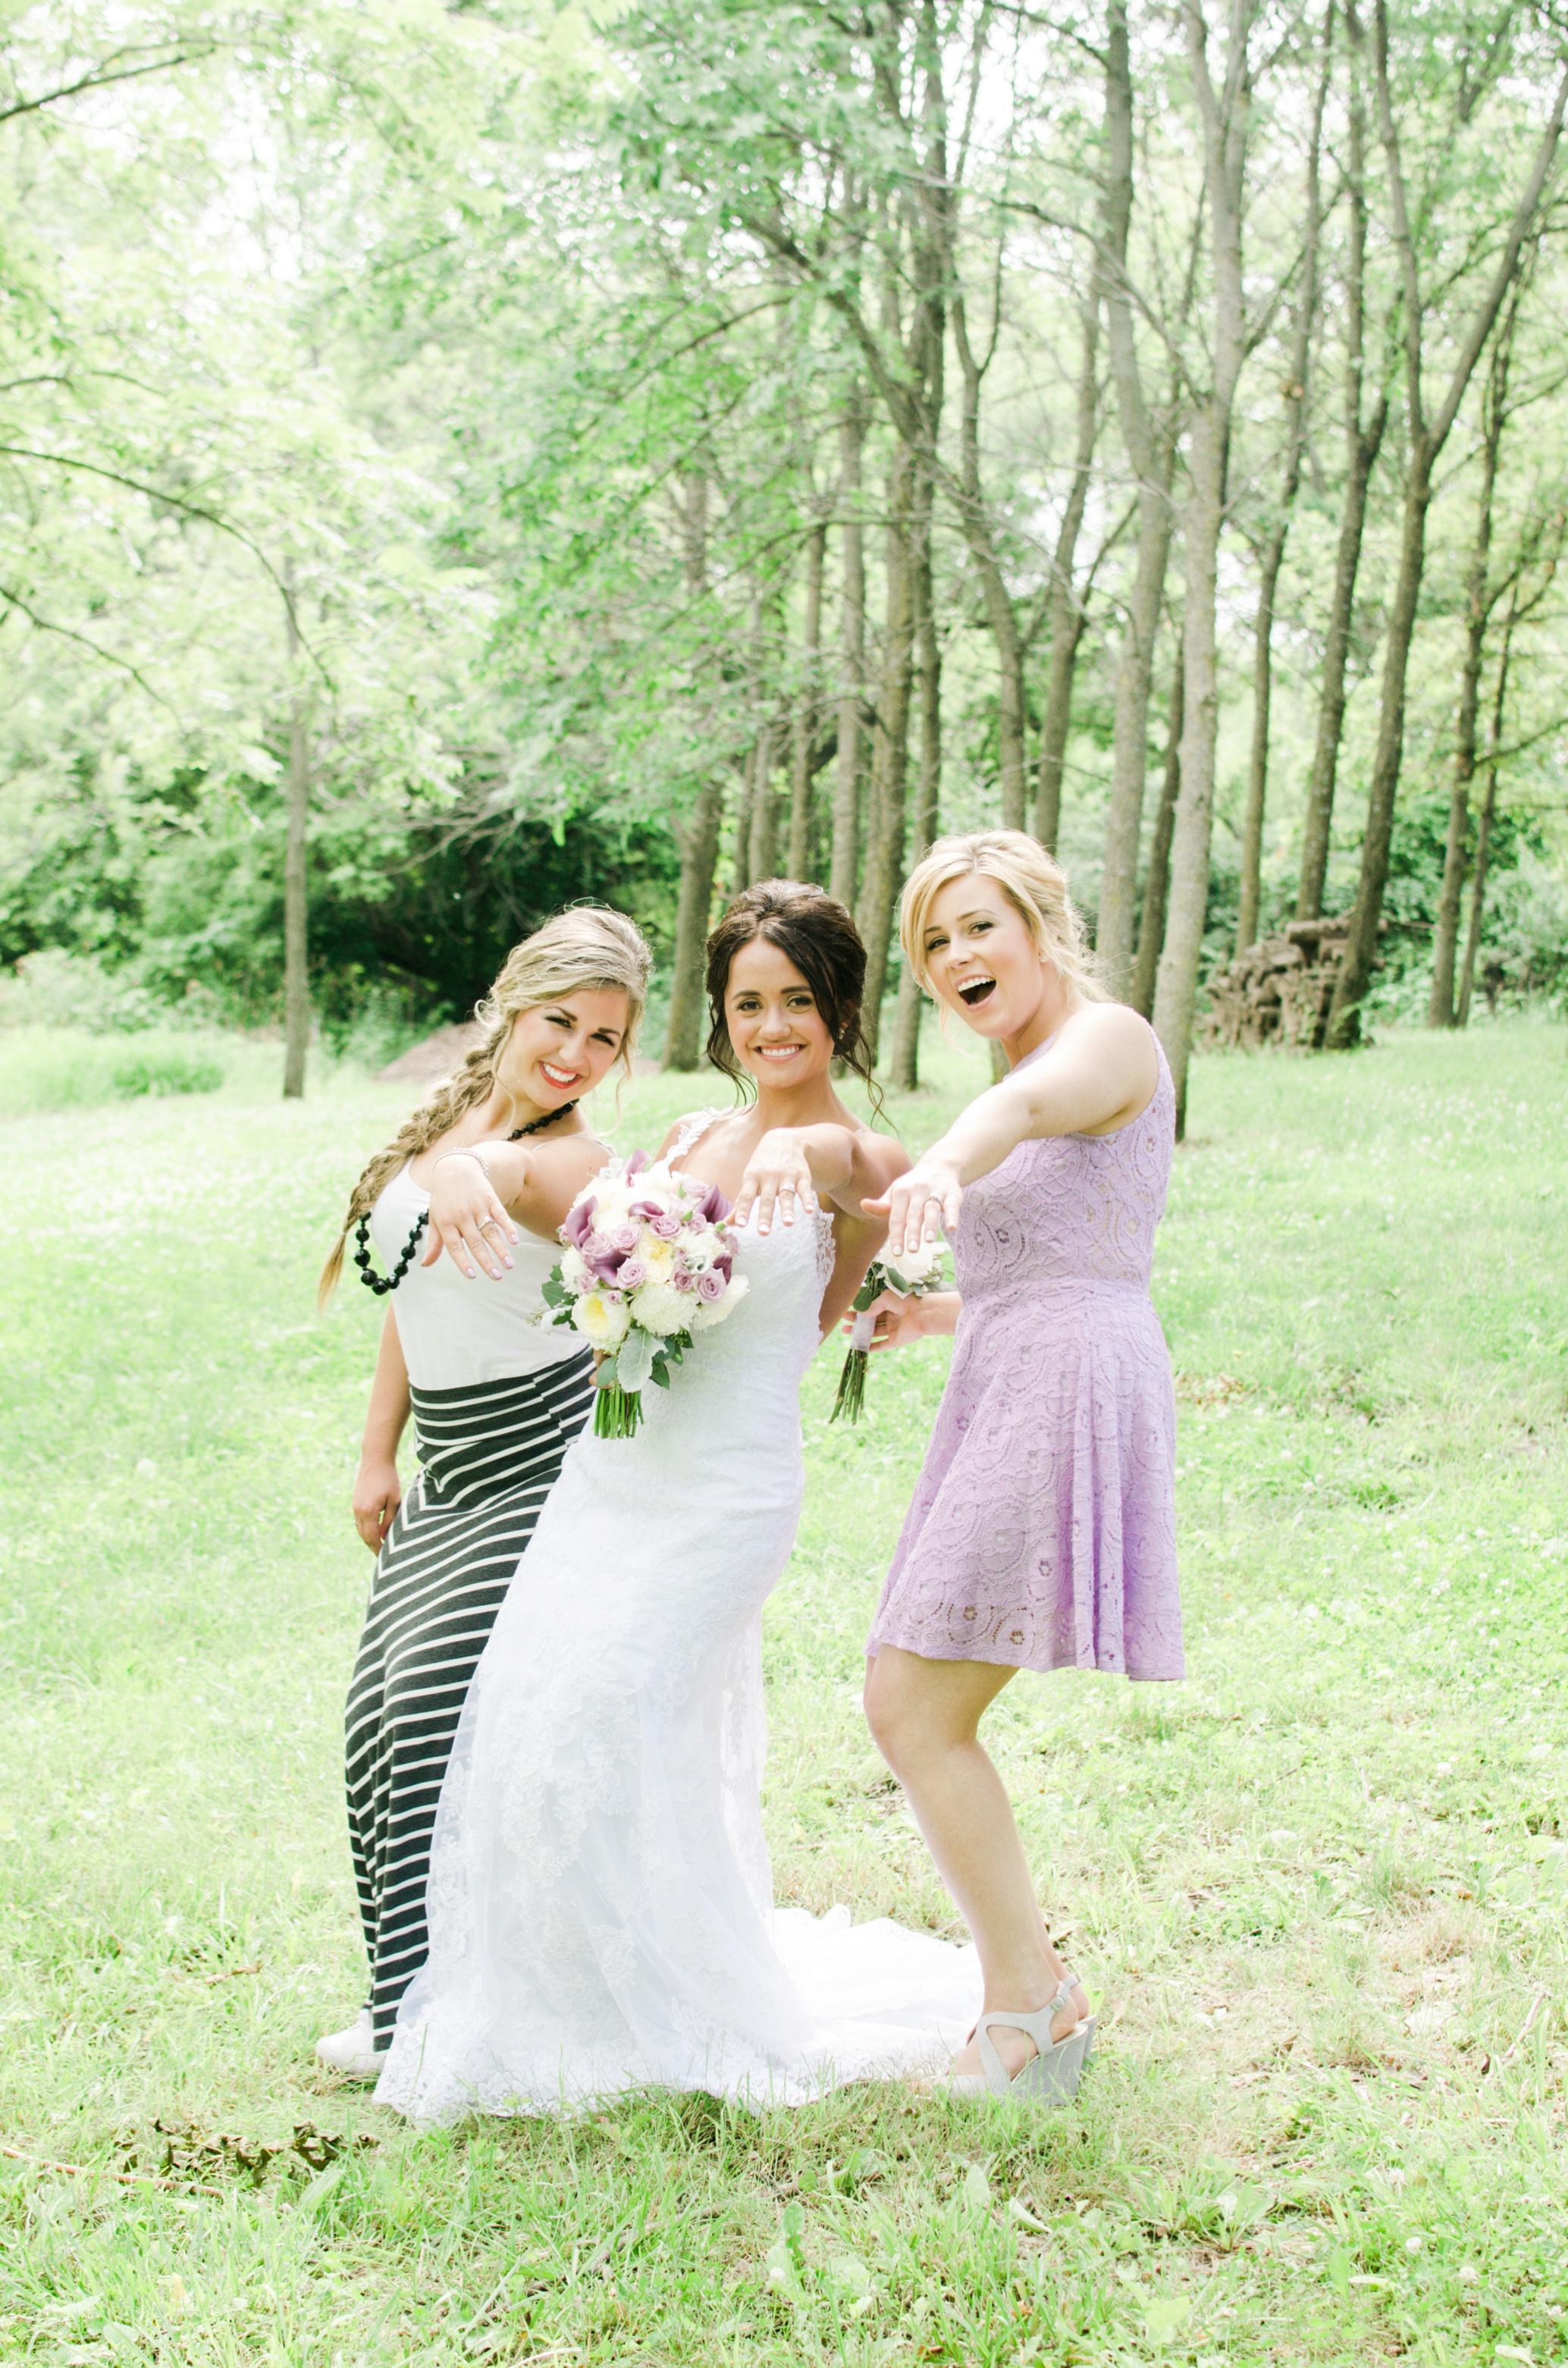 Barnes' Place Rustic Outdoor Wedding | Ali Leigh Photo Minneapolis Wedding Photographer_0116.jpg